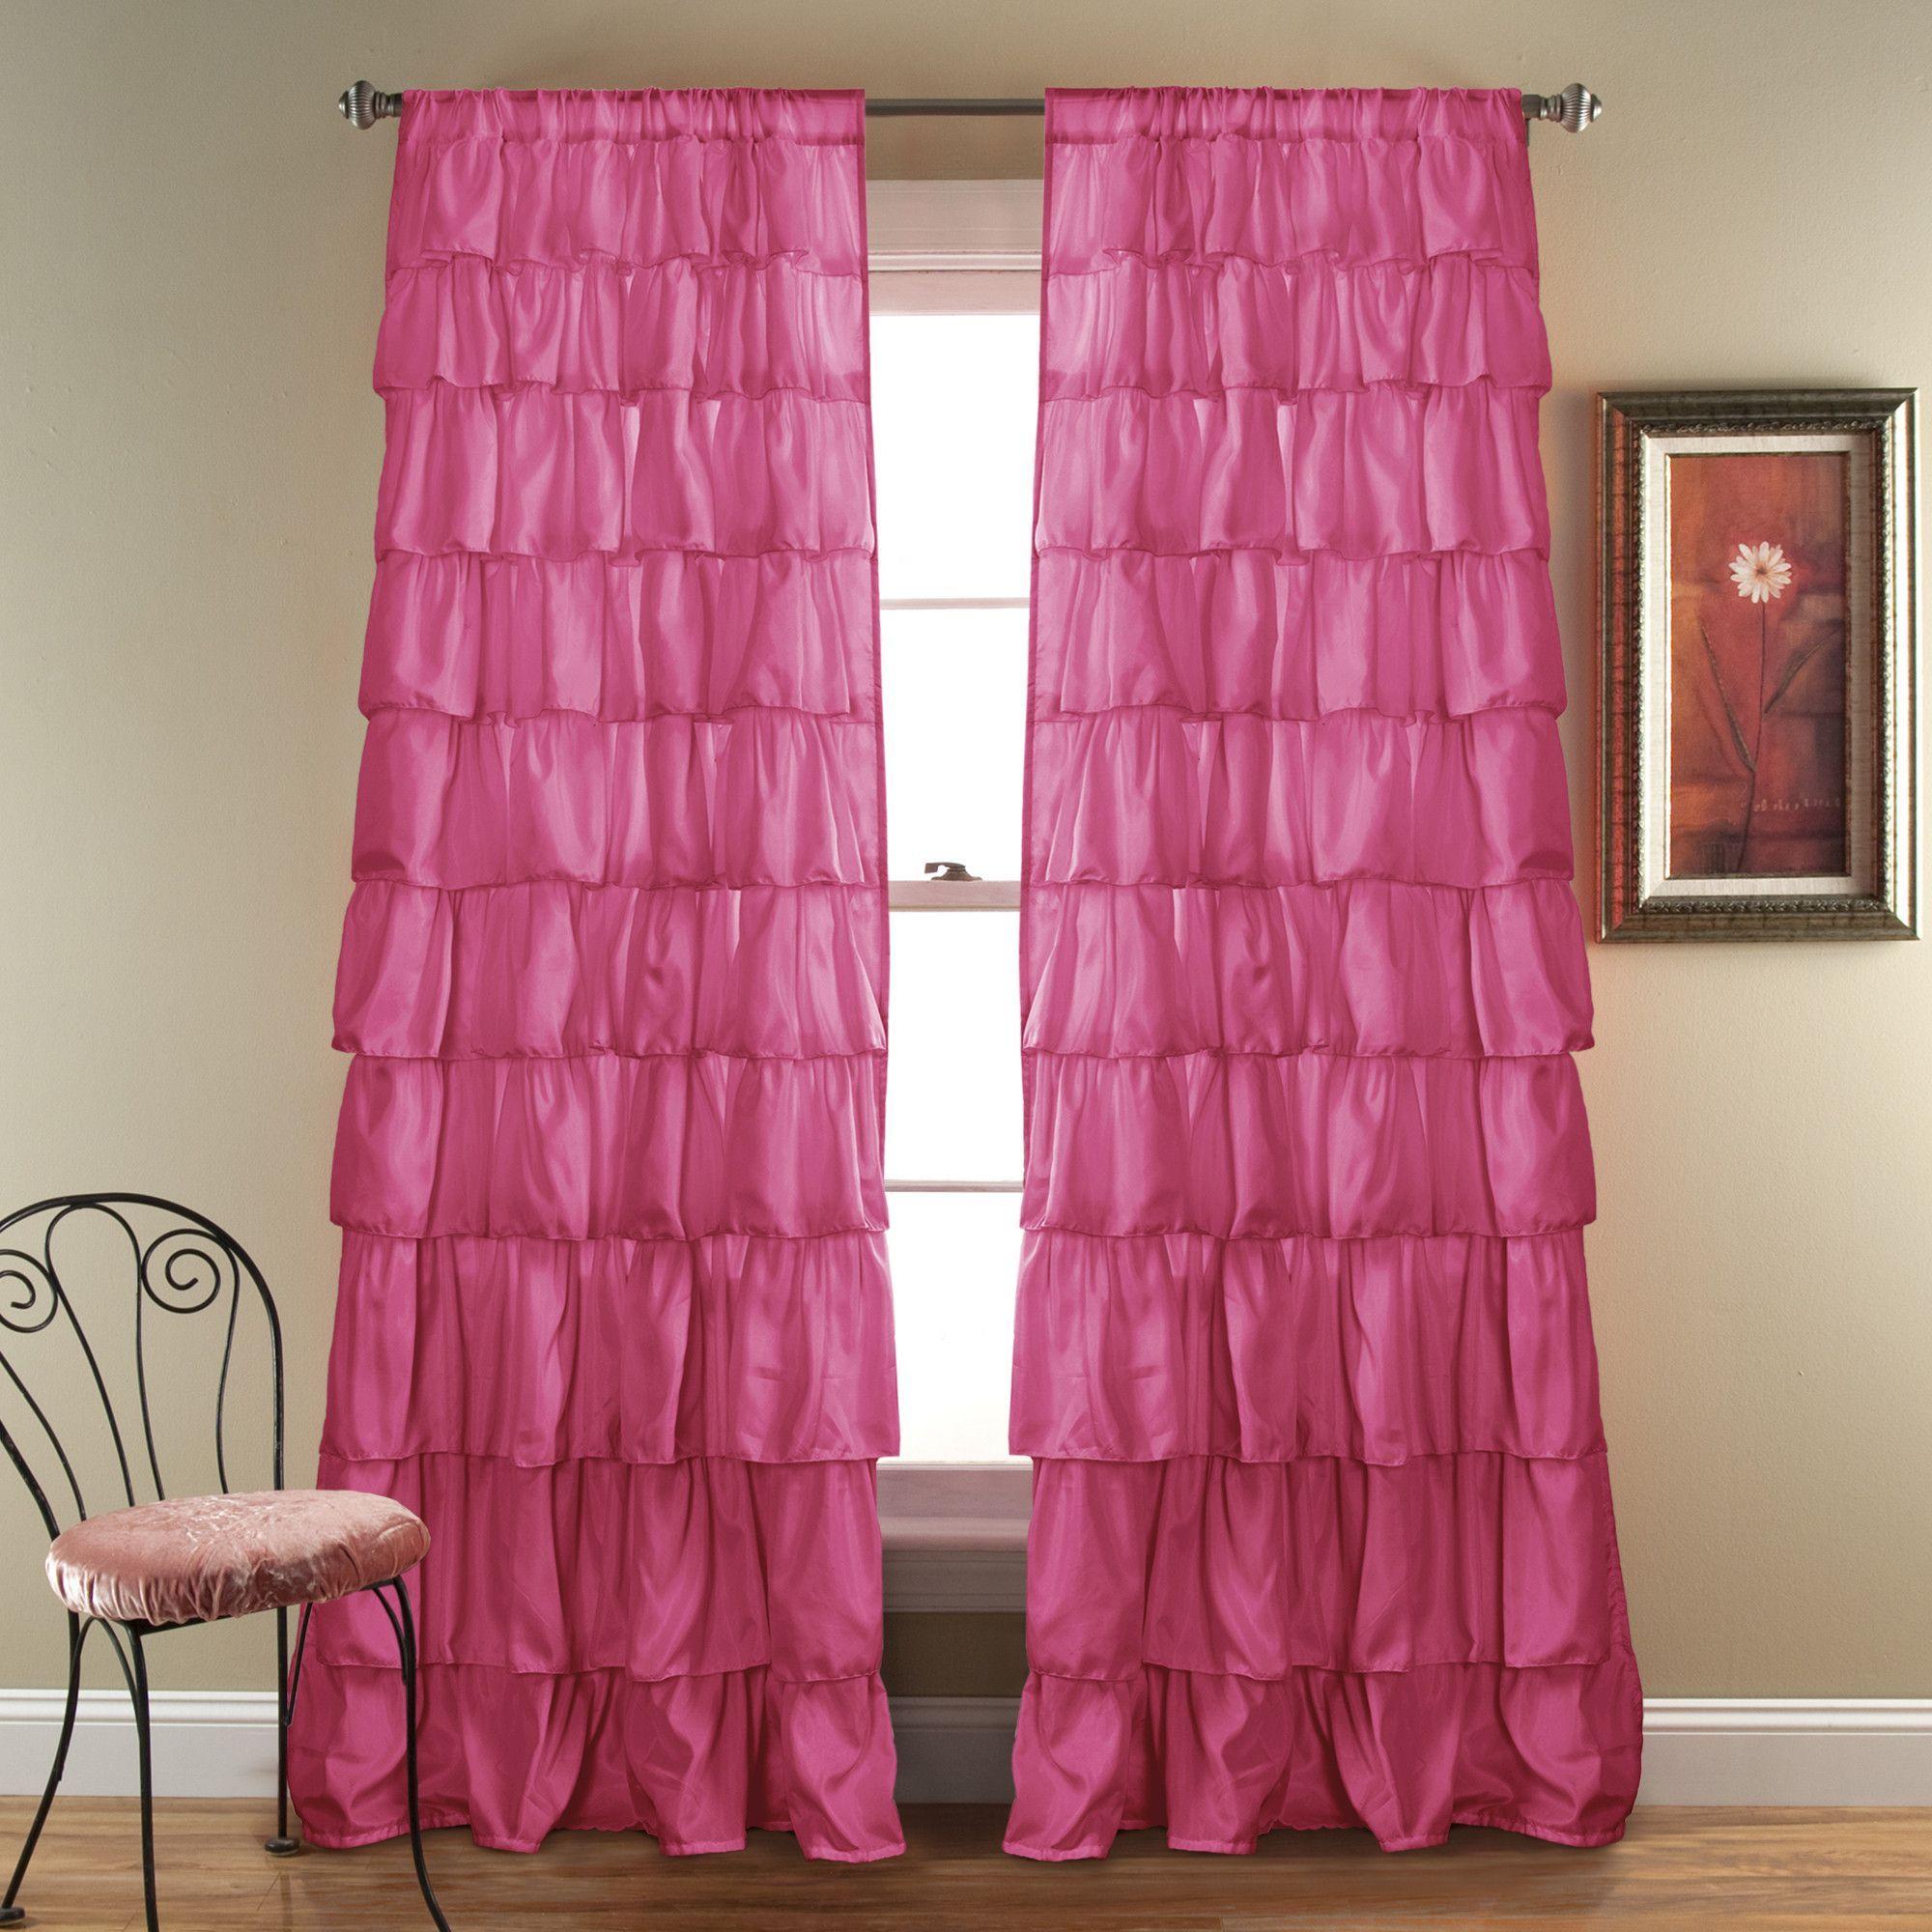 Ruffle window curtain - Ruffle Window Curtain